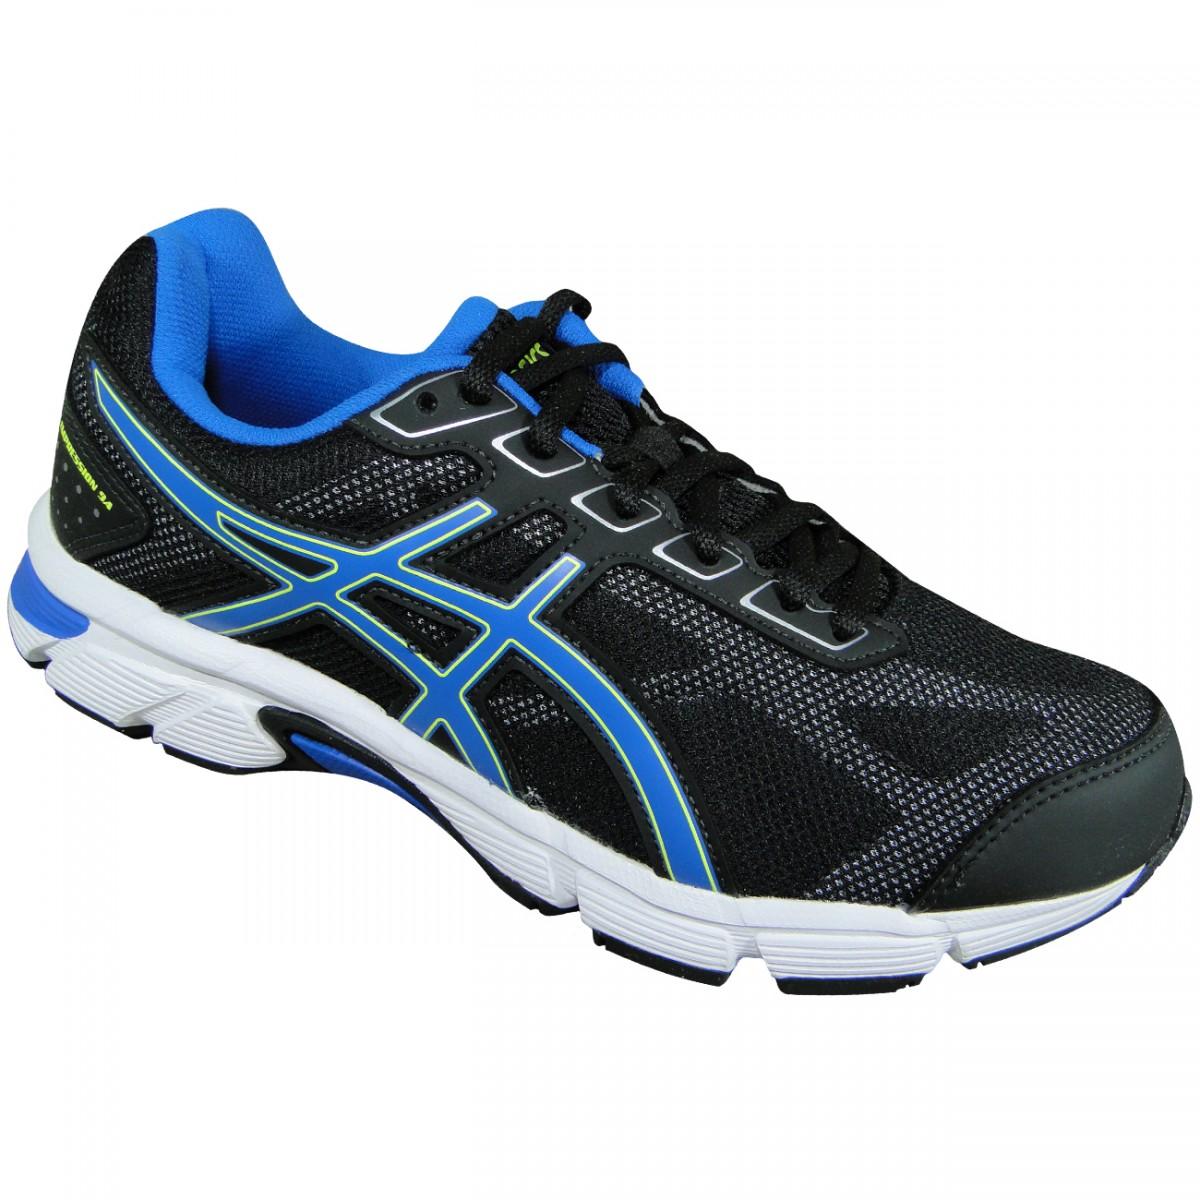 d93cfa6705 Tenis Asics Gel-Impression 9 T021A 9039 - Preto Azul Branco - Chuteira  Nike